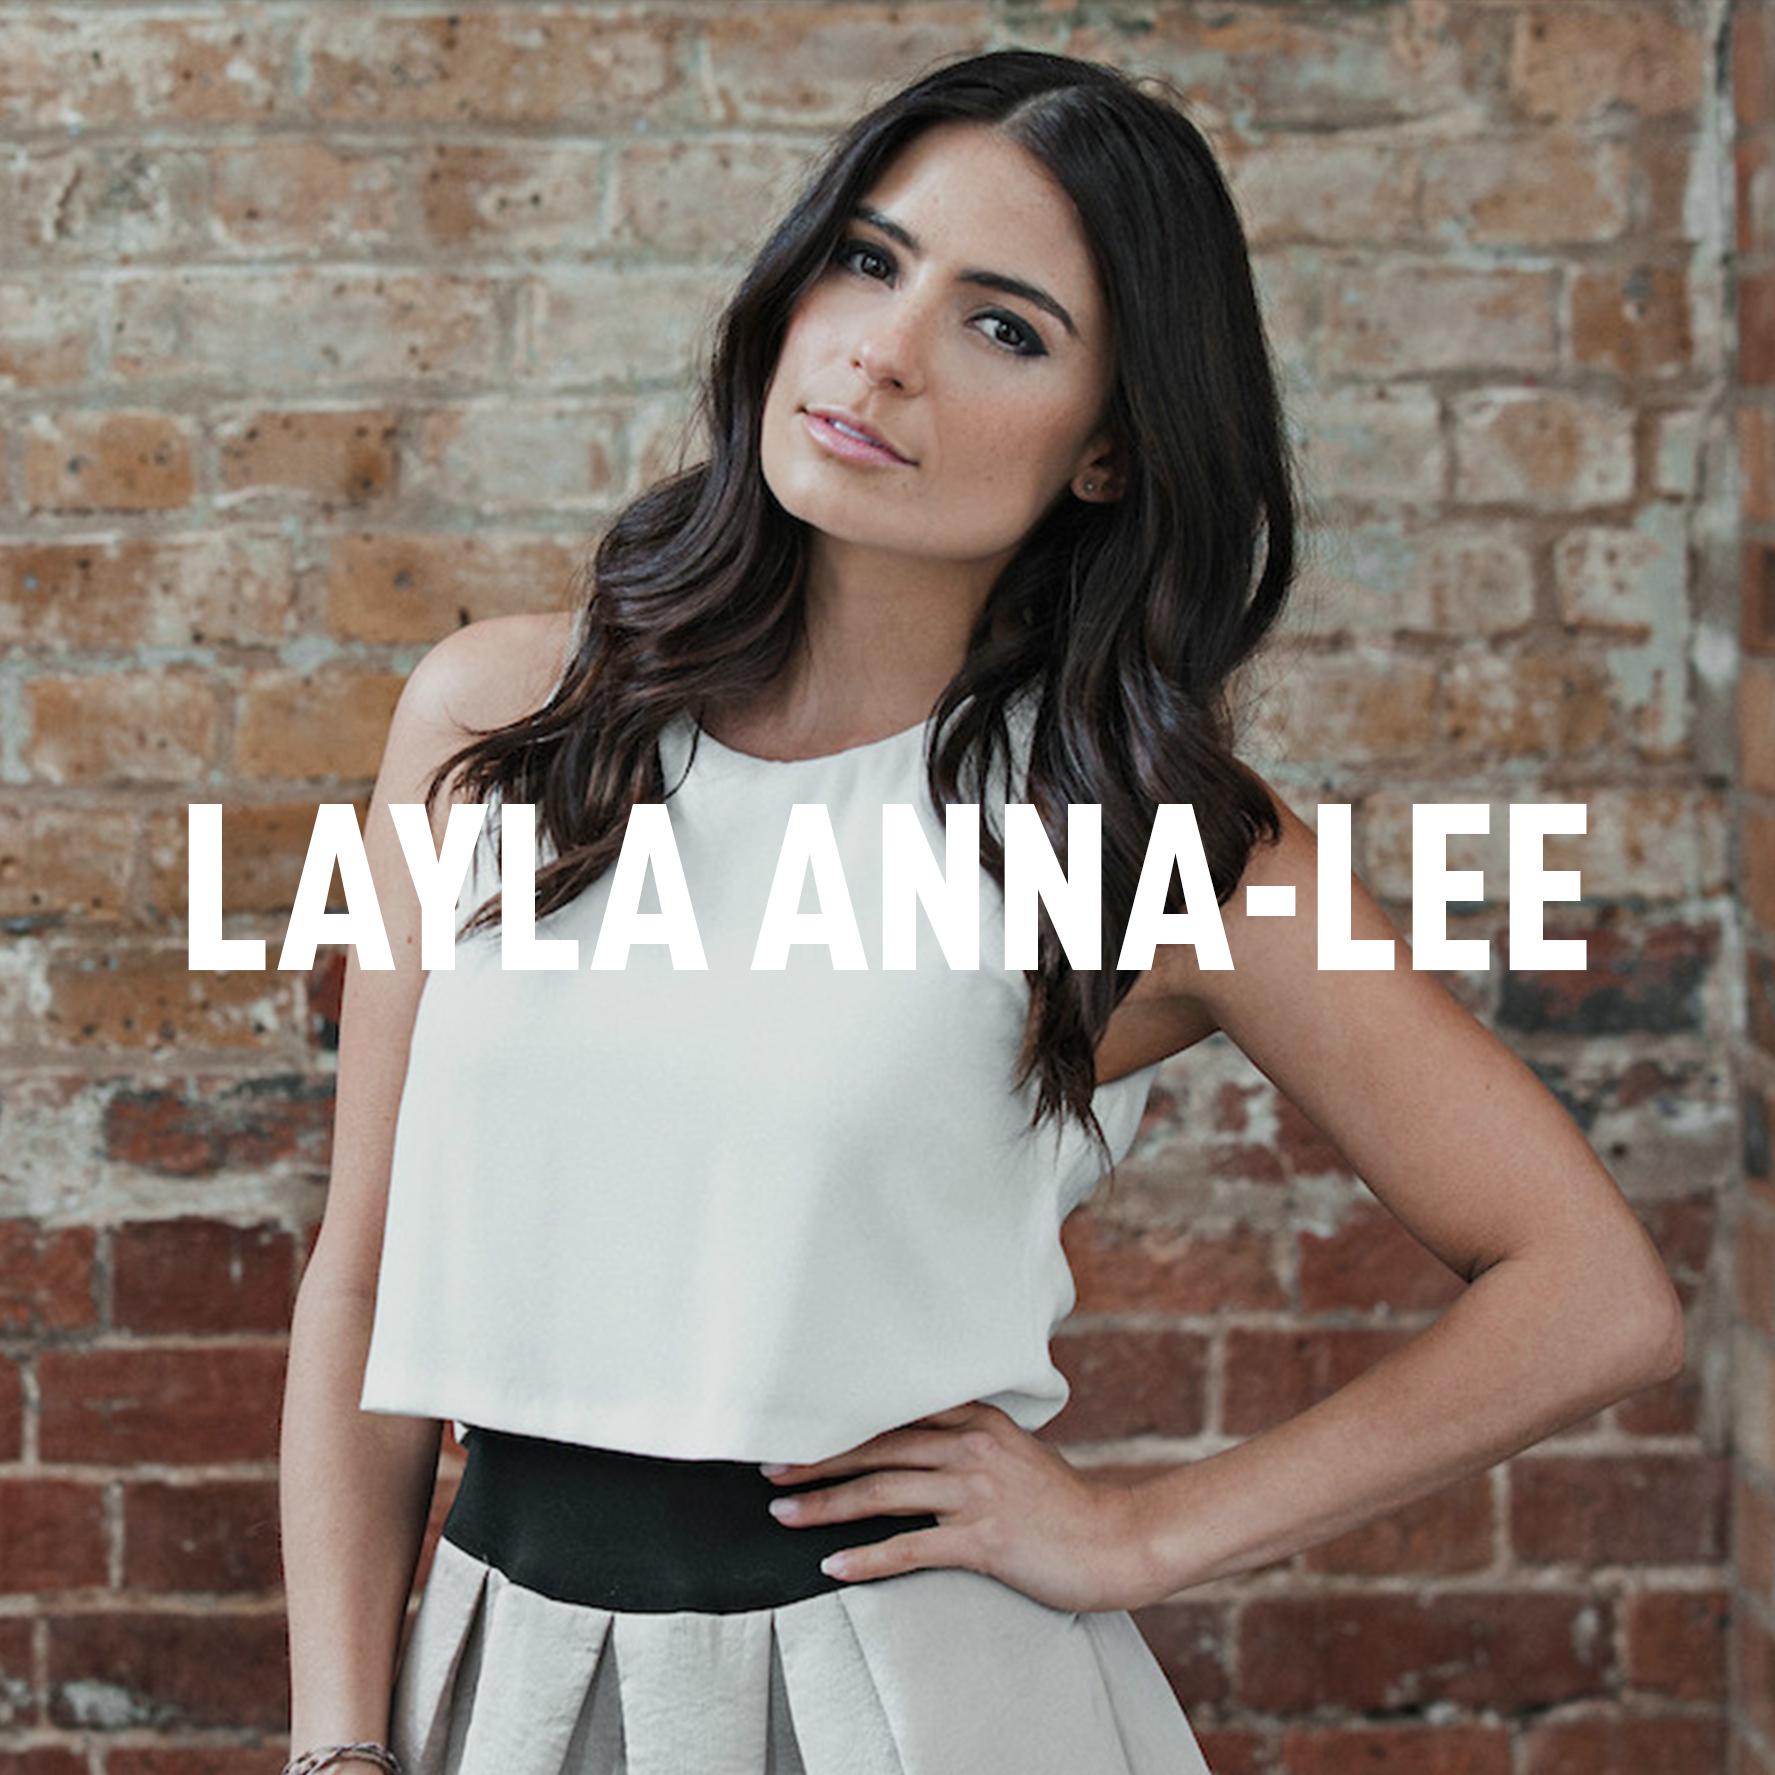 Layla-AnnaLee.jpg